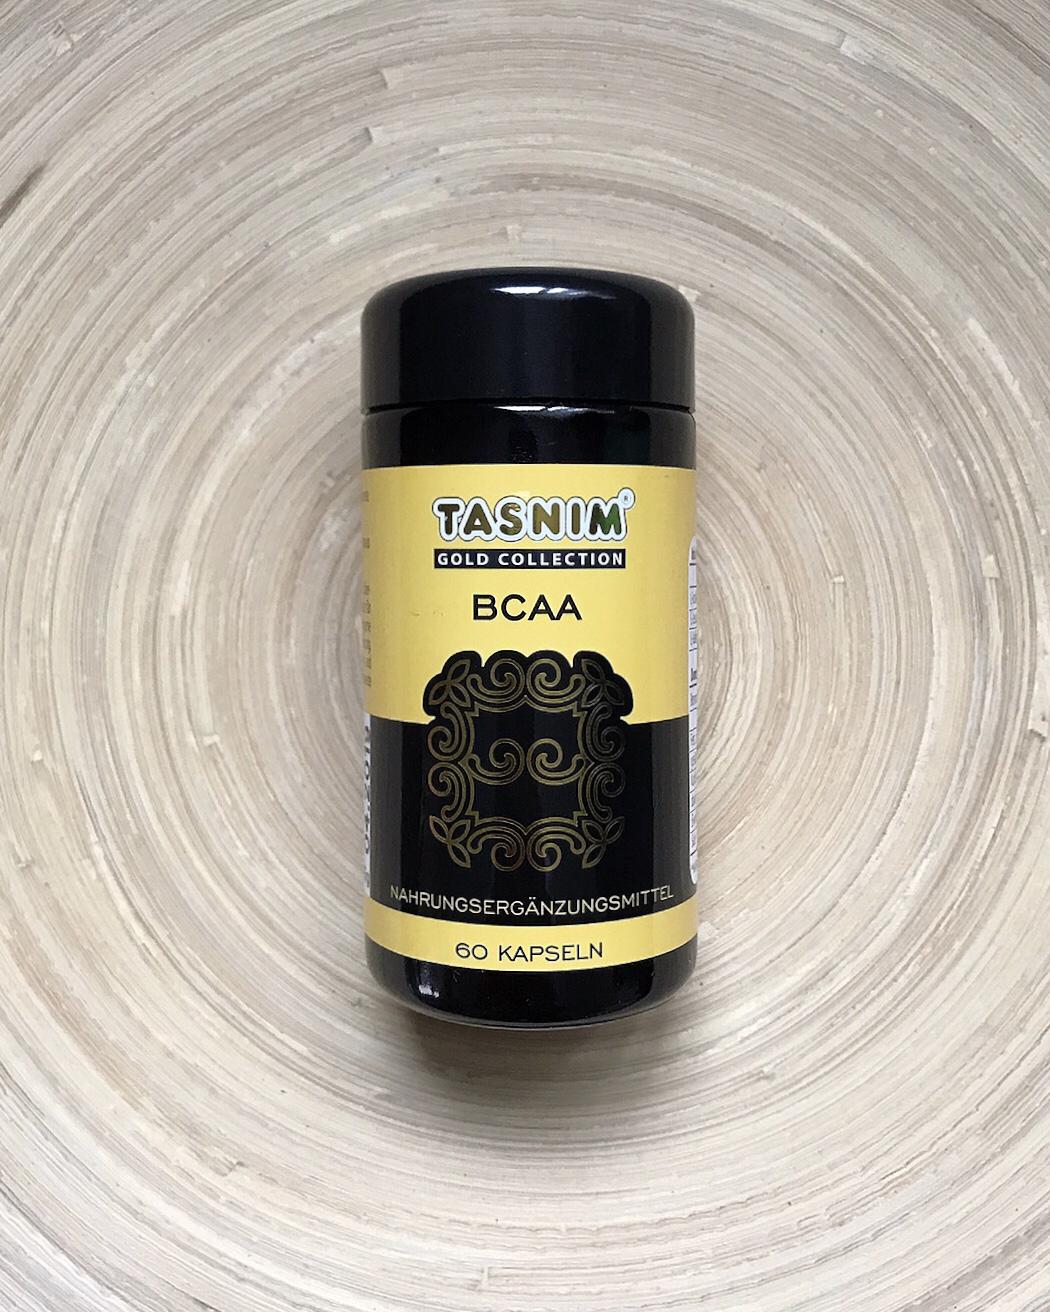 Tasnim - BCAA